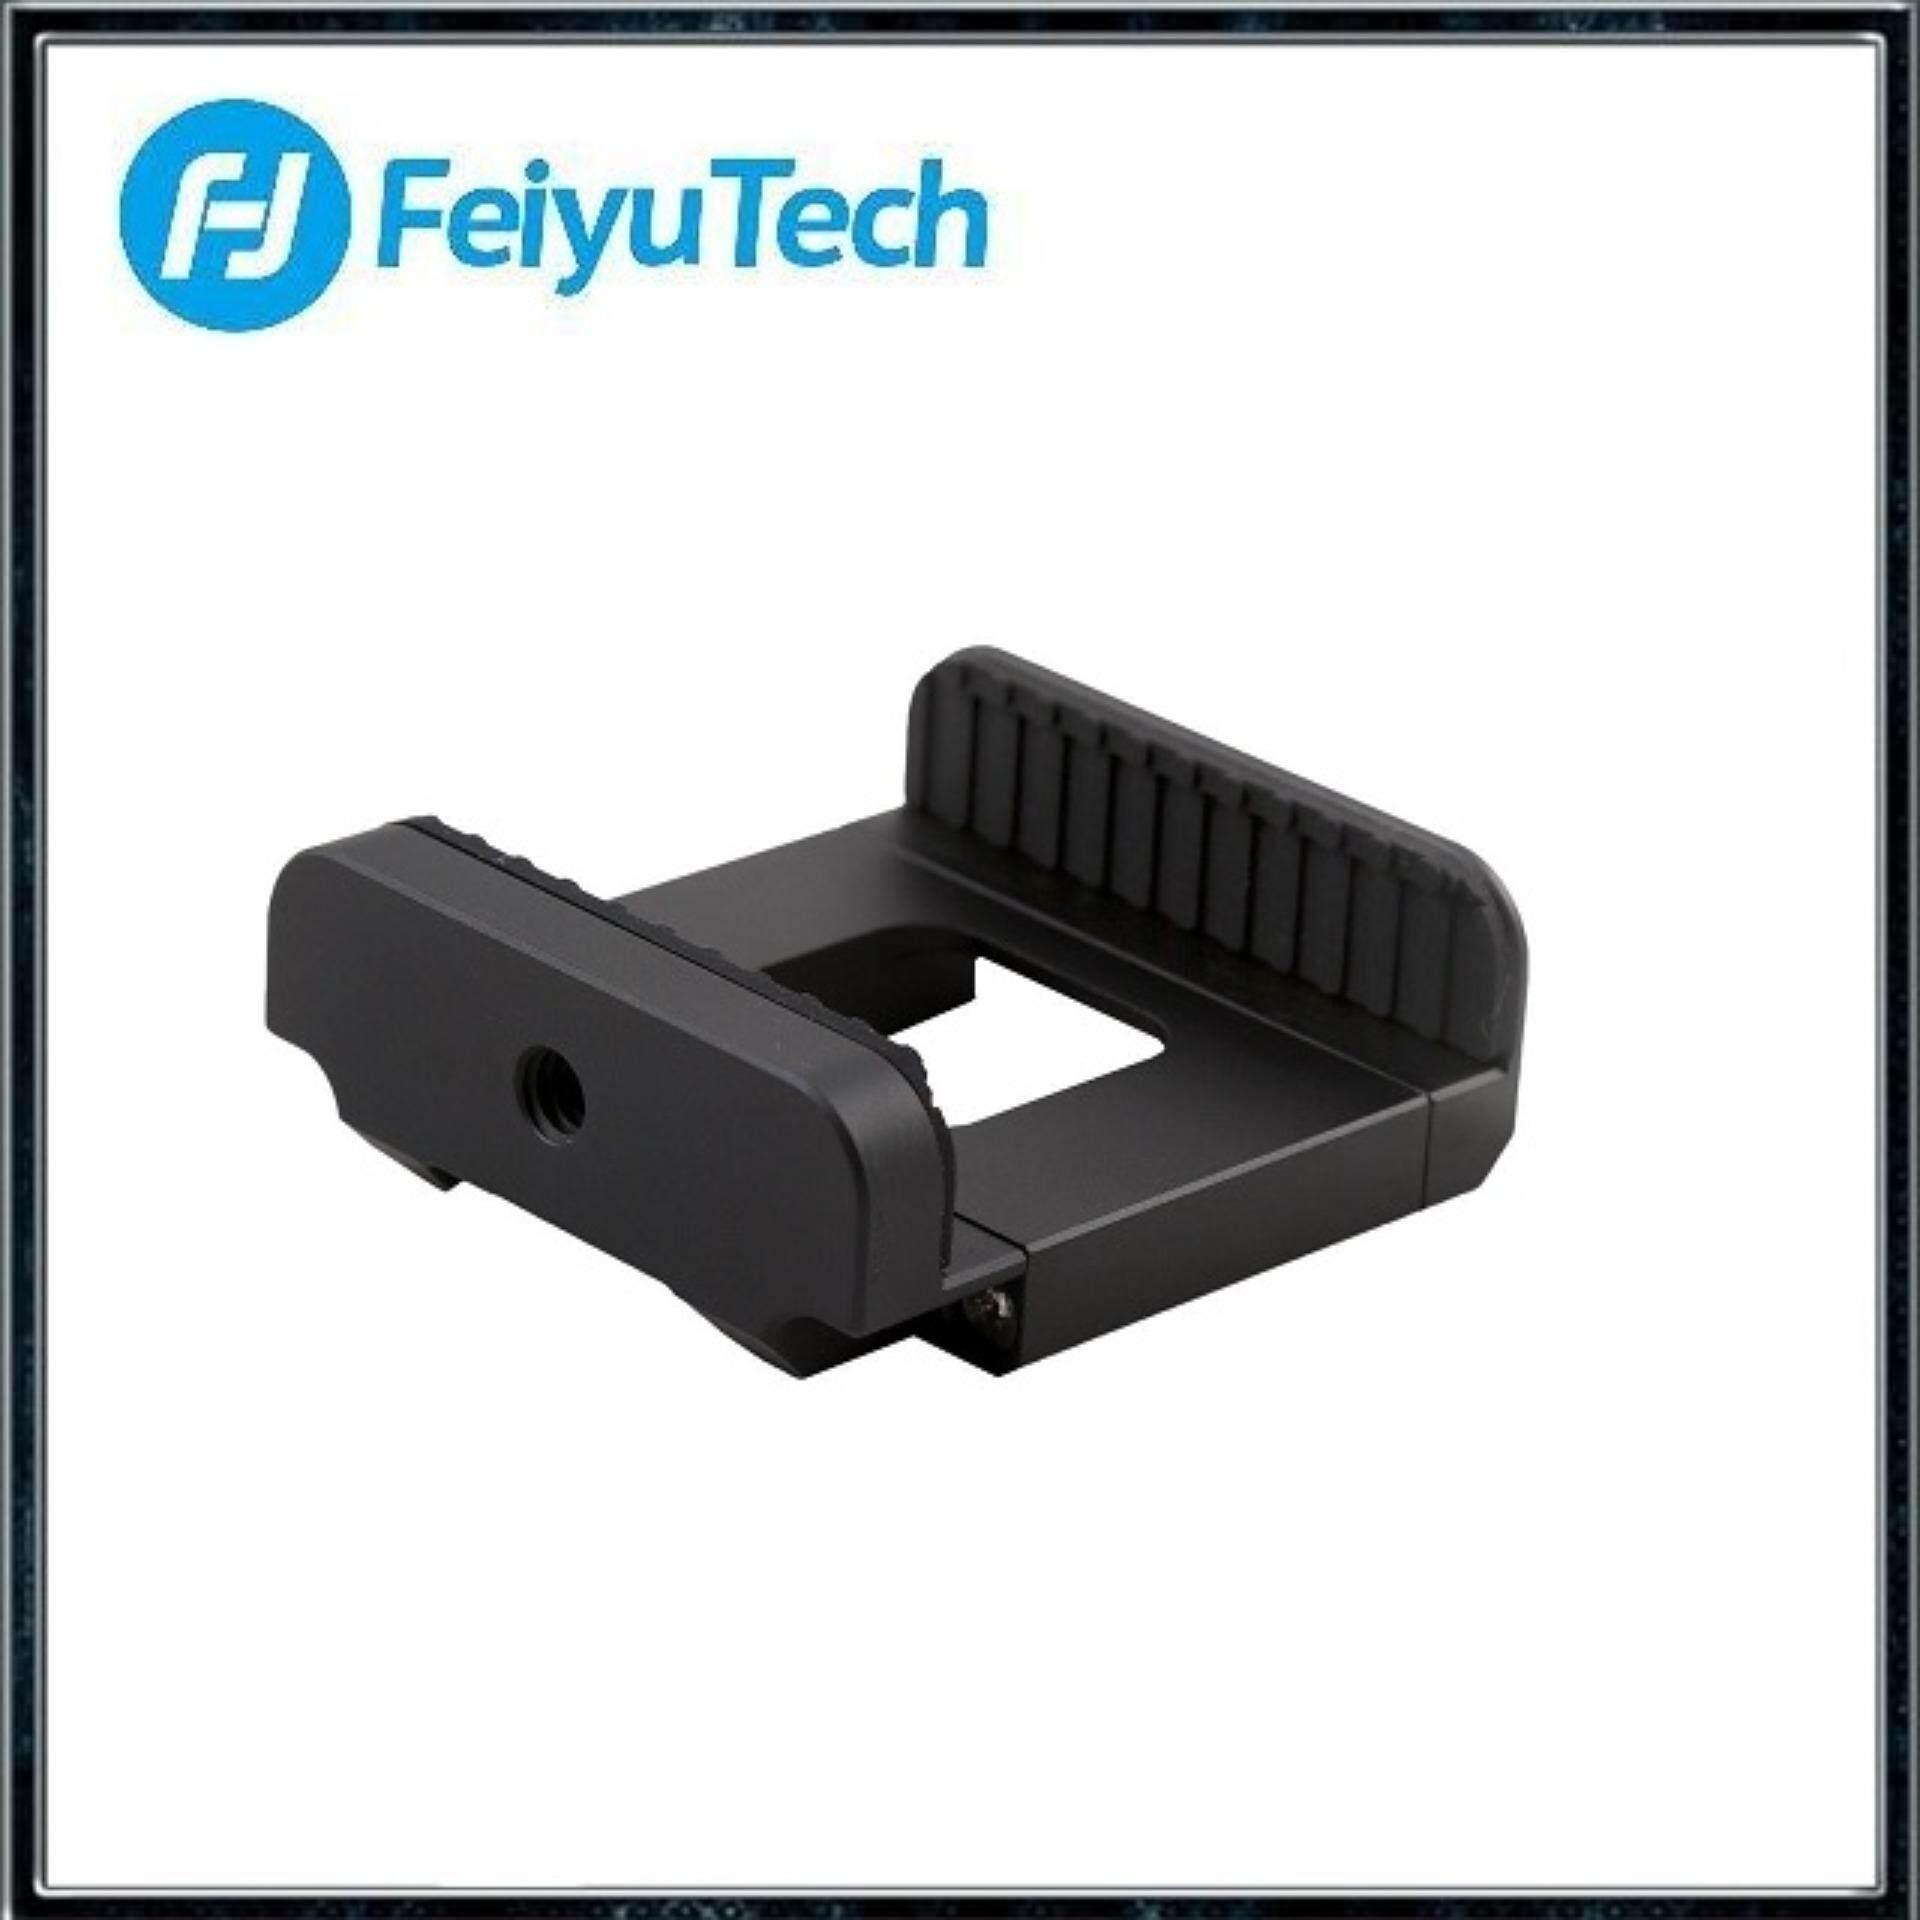 FeiyuTech Smartphone Adapter